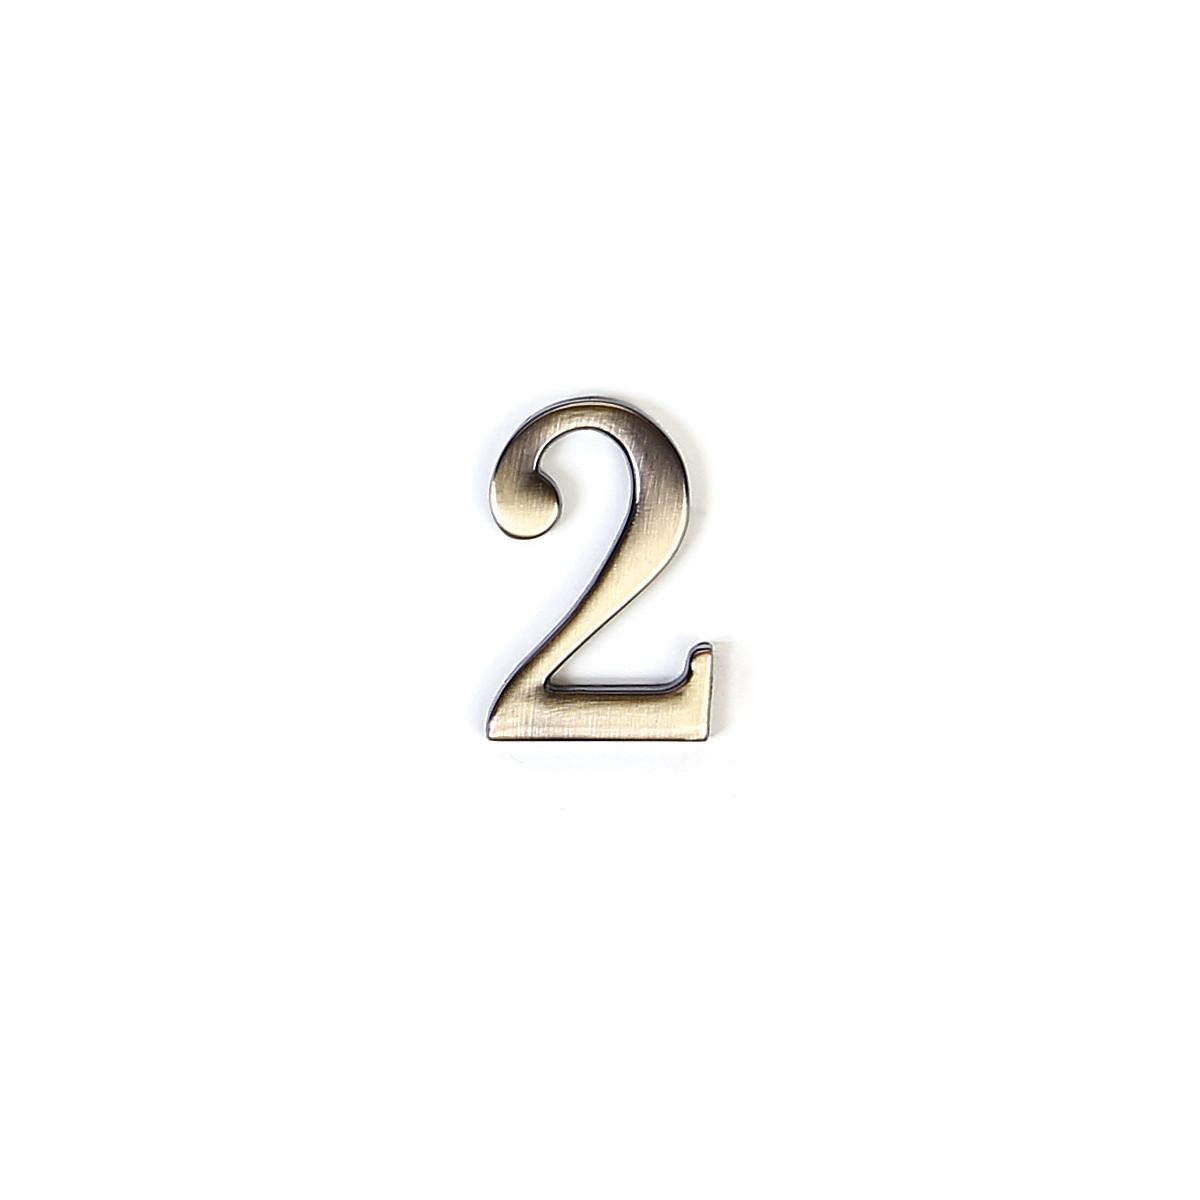 Номер на дверь из цинка Larvij цифра 2 антик бронза (LNZ4 AB #2)